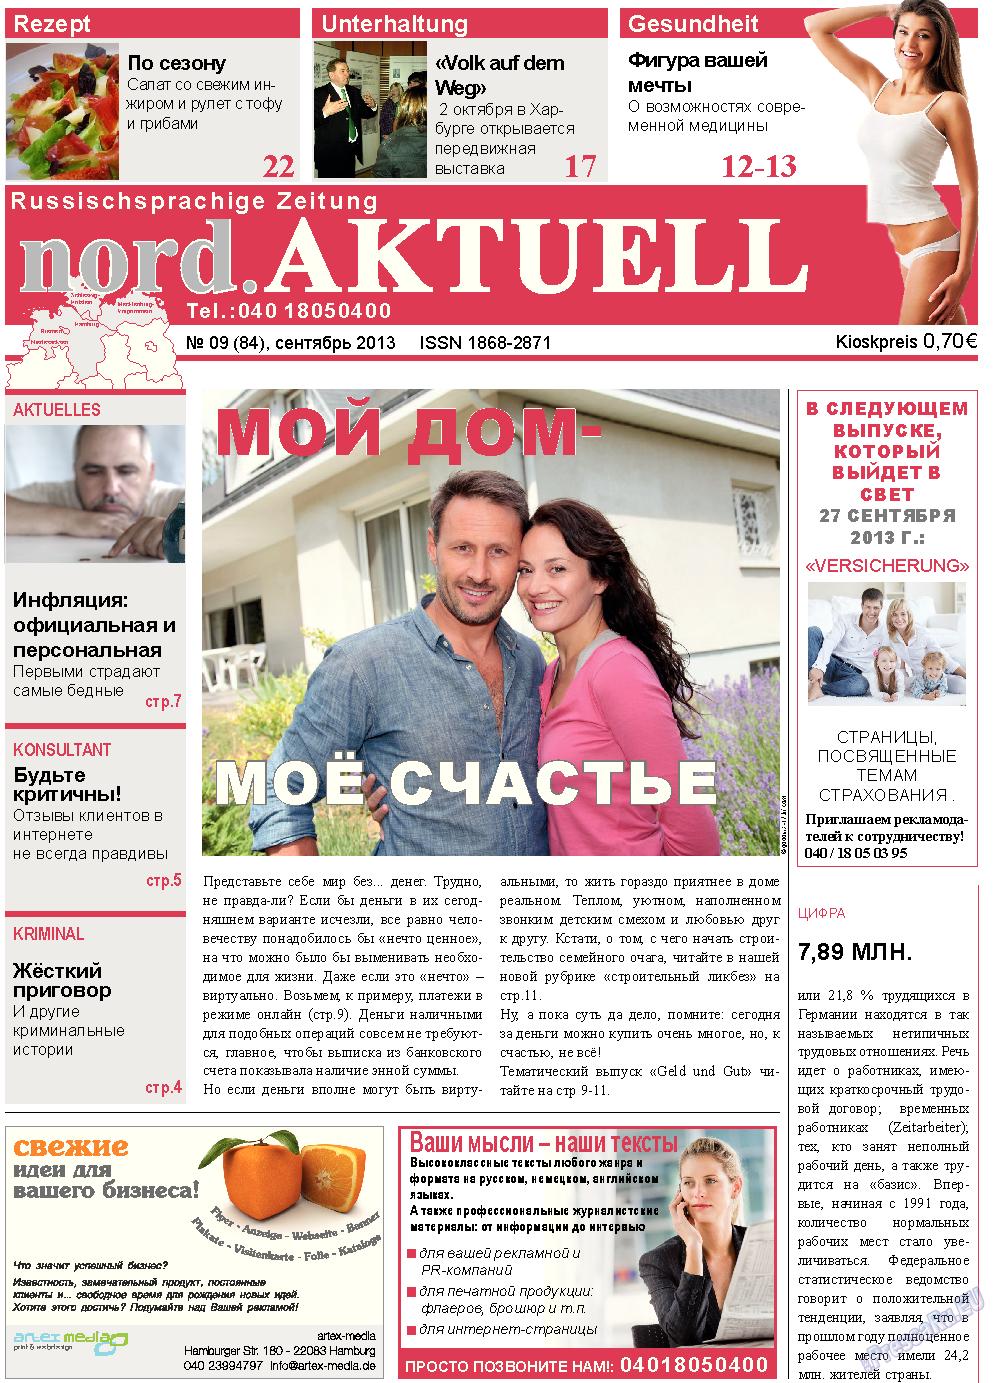 nord.Aktuell (газета). 2013 год, номер 9, стр. 1